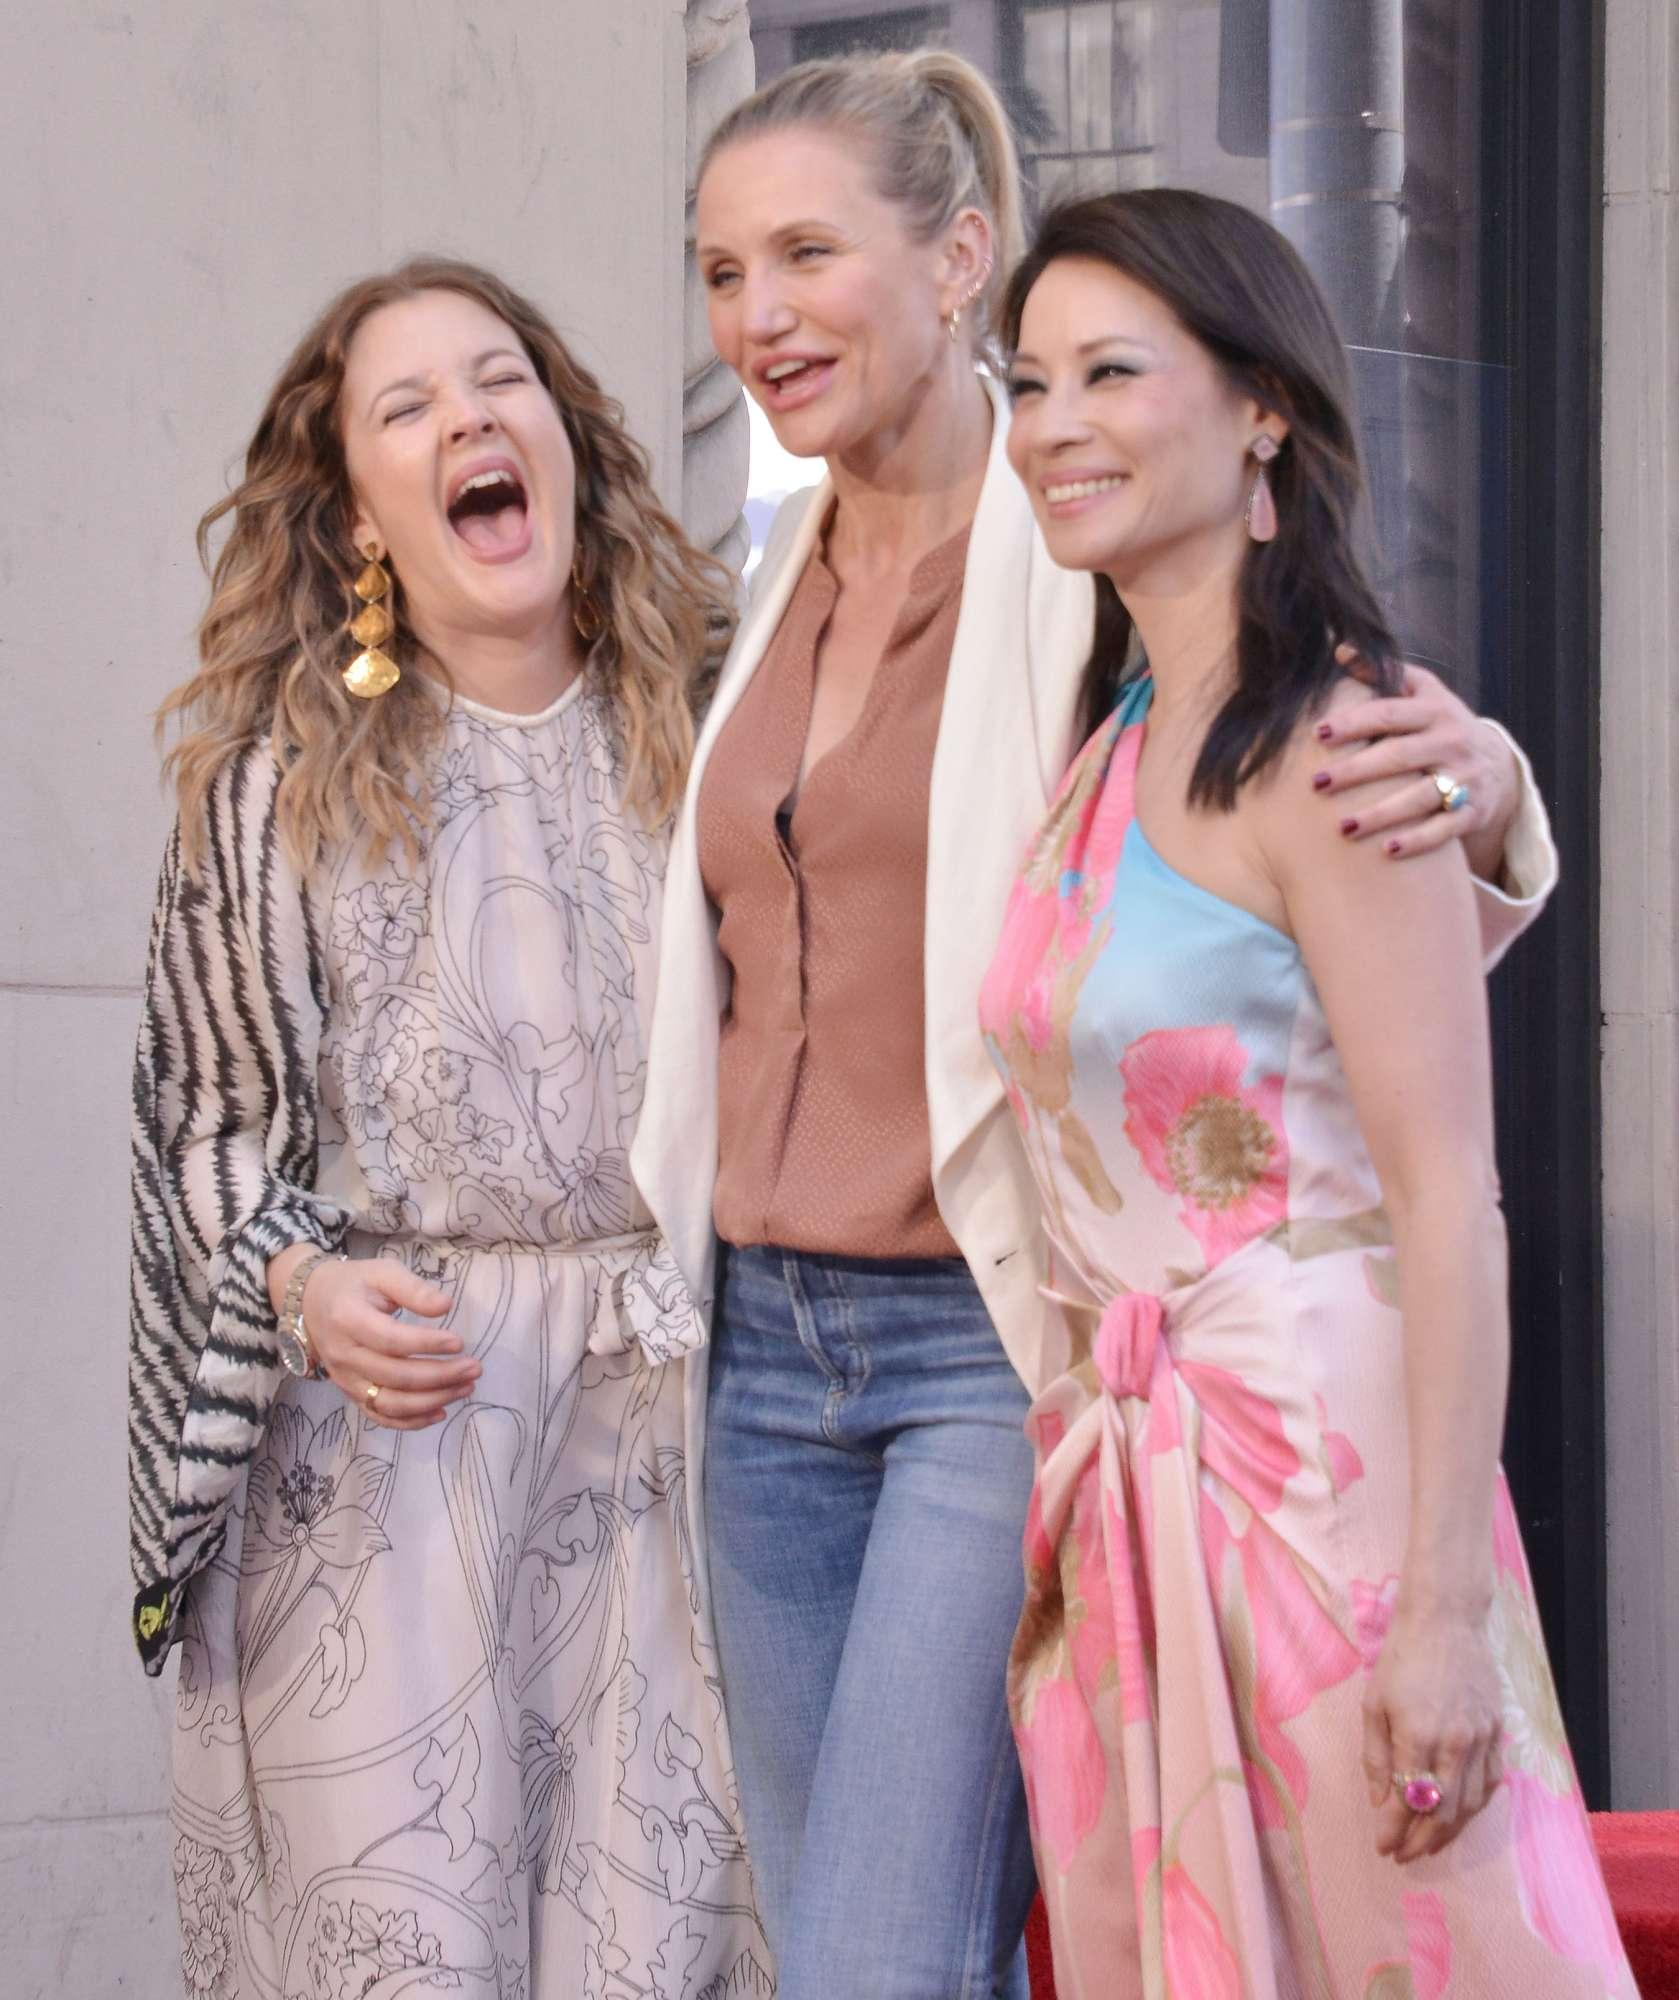 Le Charlie s Angels si riuniscono: Cameron Diaz, Drew Barrymore e Lucy Liu insieme